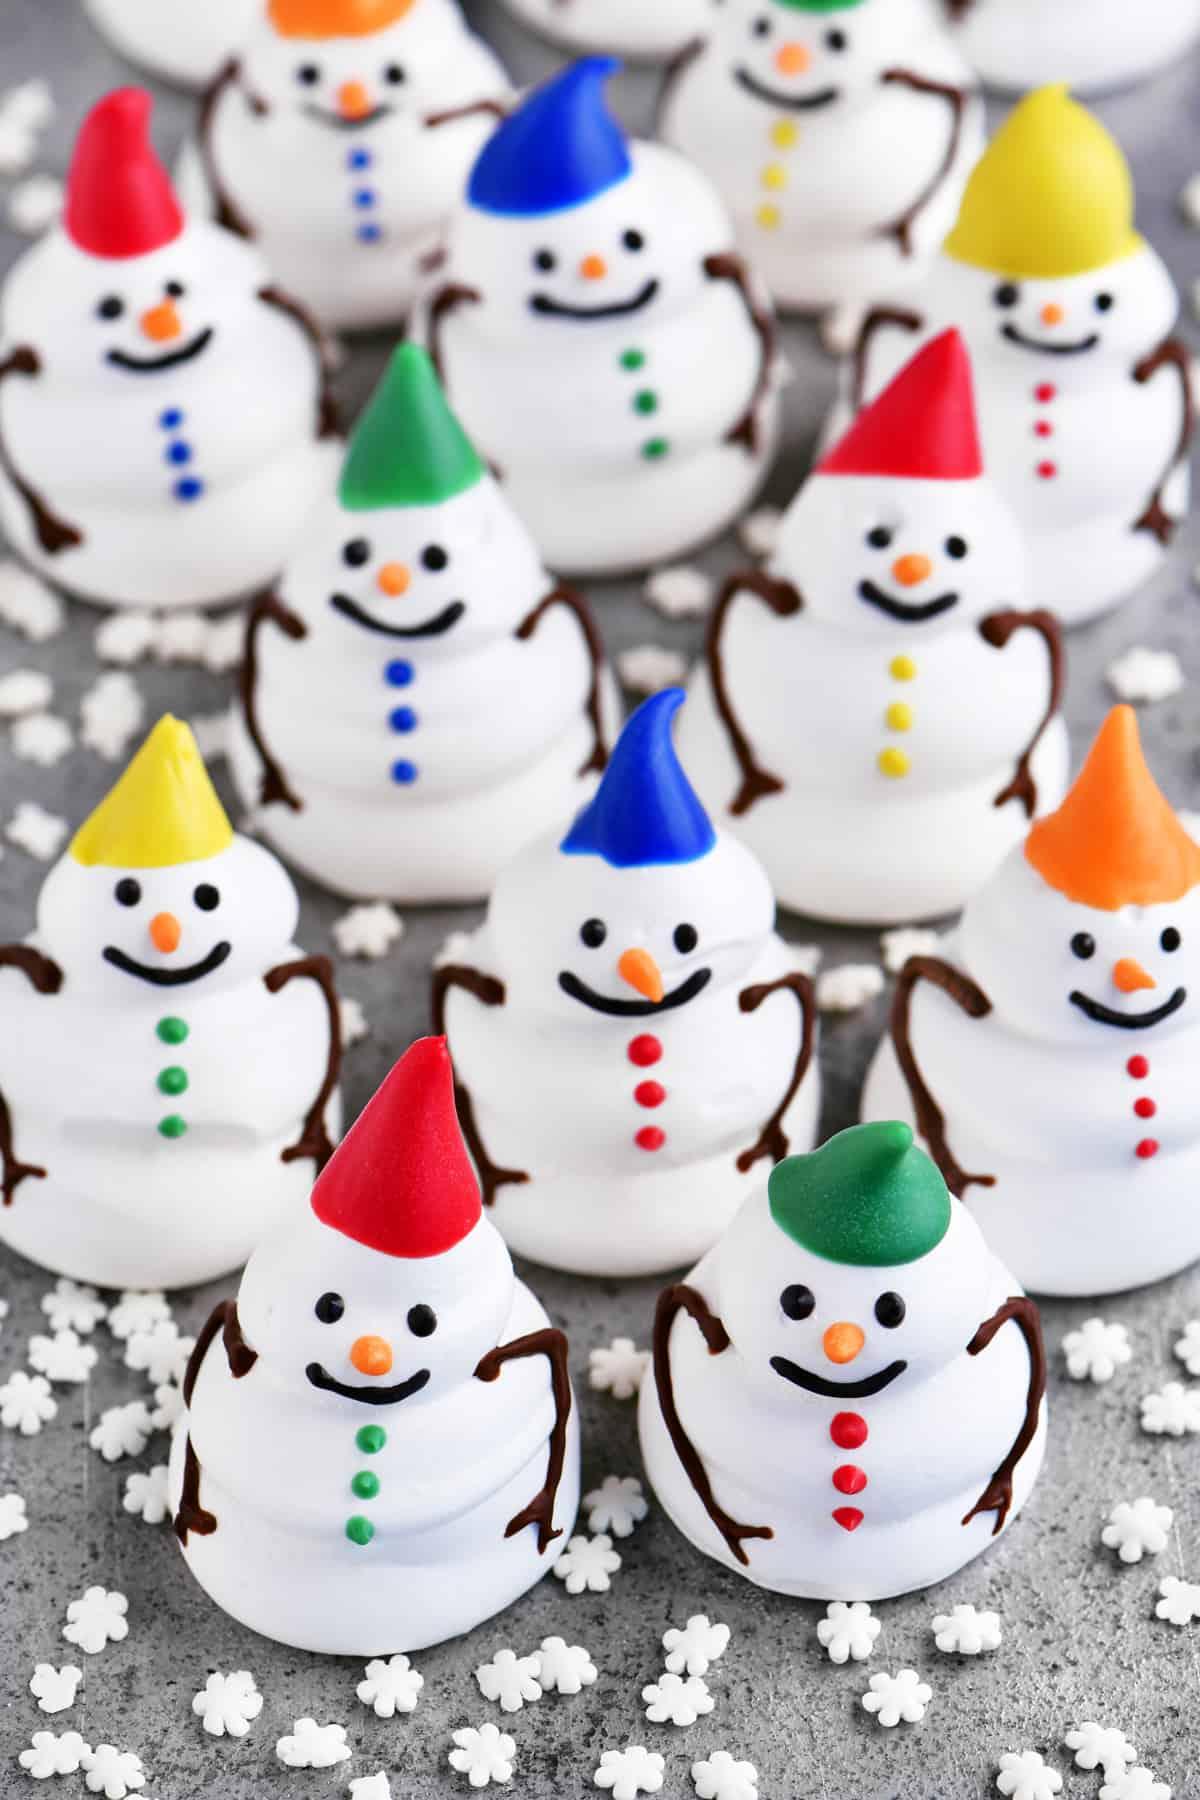 a topdown photo of the little meringue snowman cookies